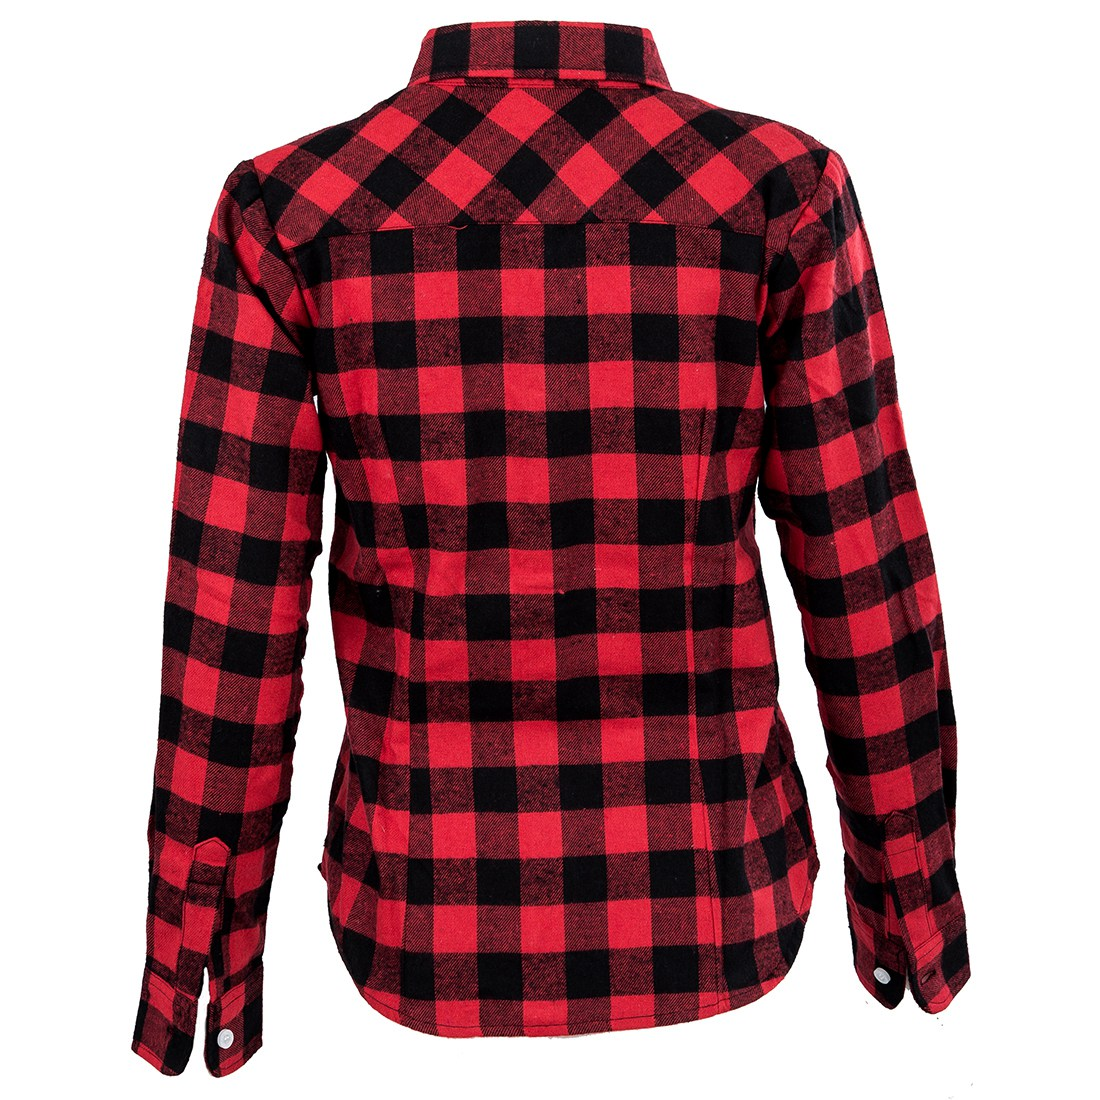 Cs498 Womens Shirt Flannel Shirts Tops Blouse Red Black